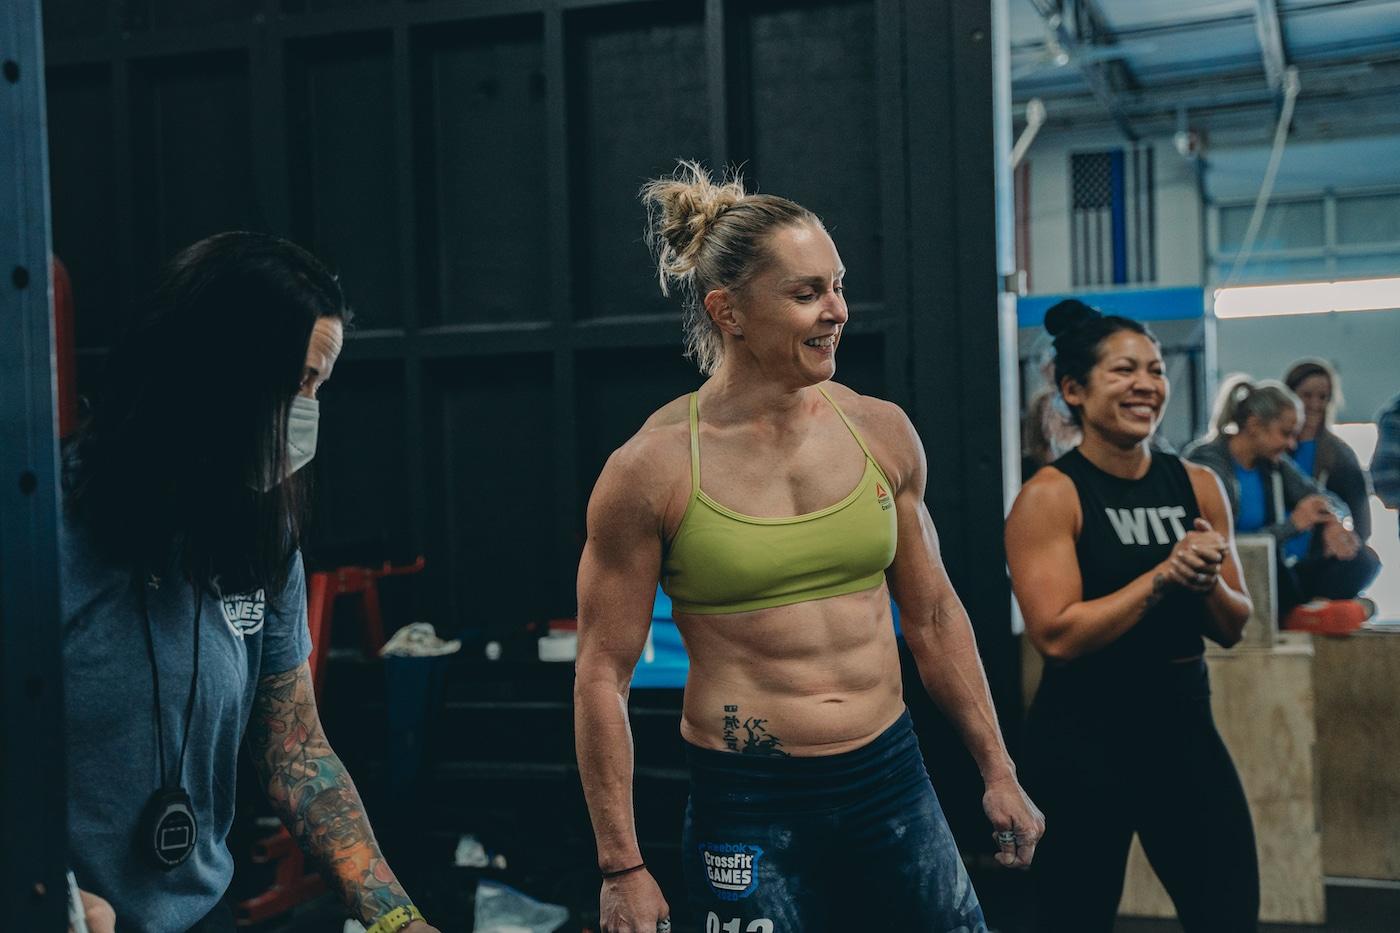 Sam Briggs CrossFit Games 2020.37